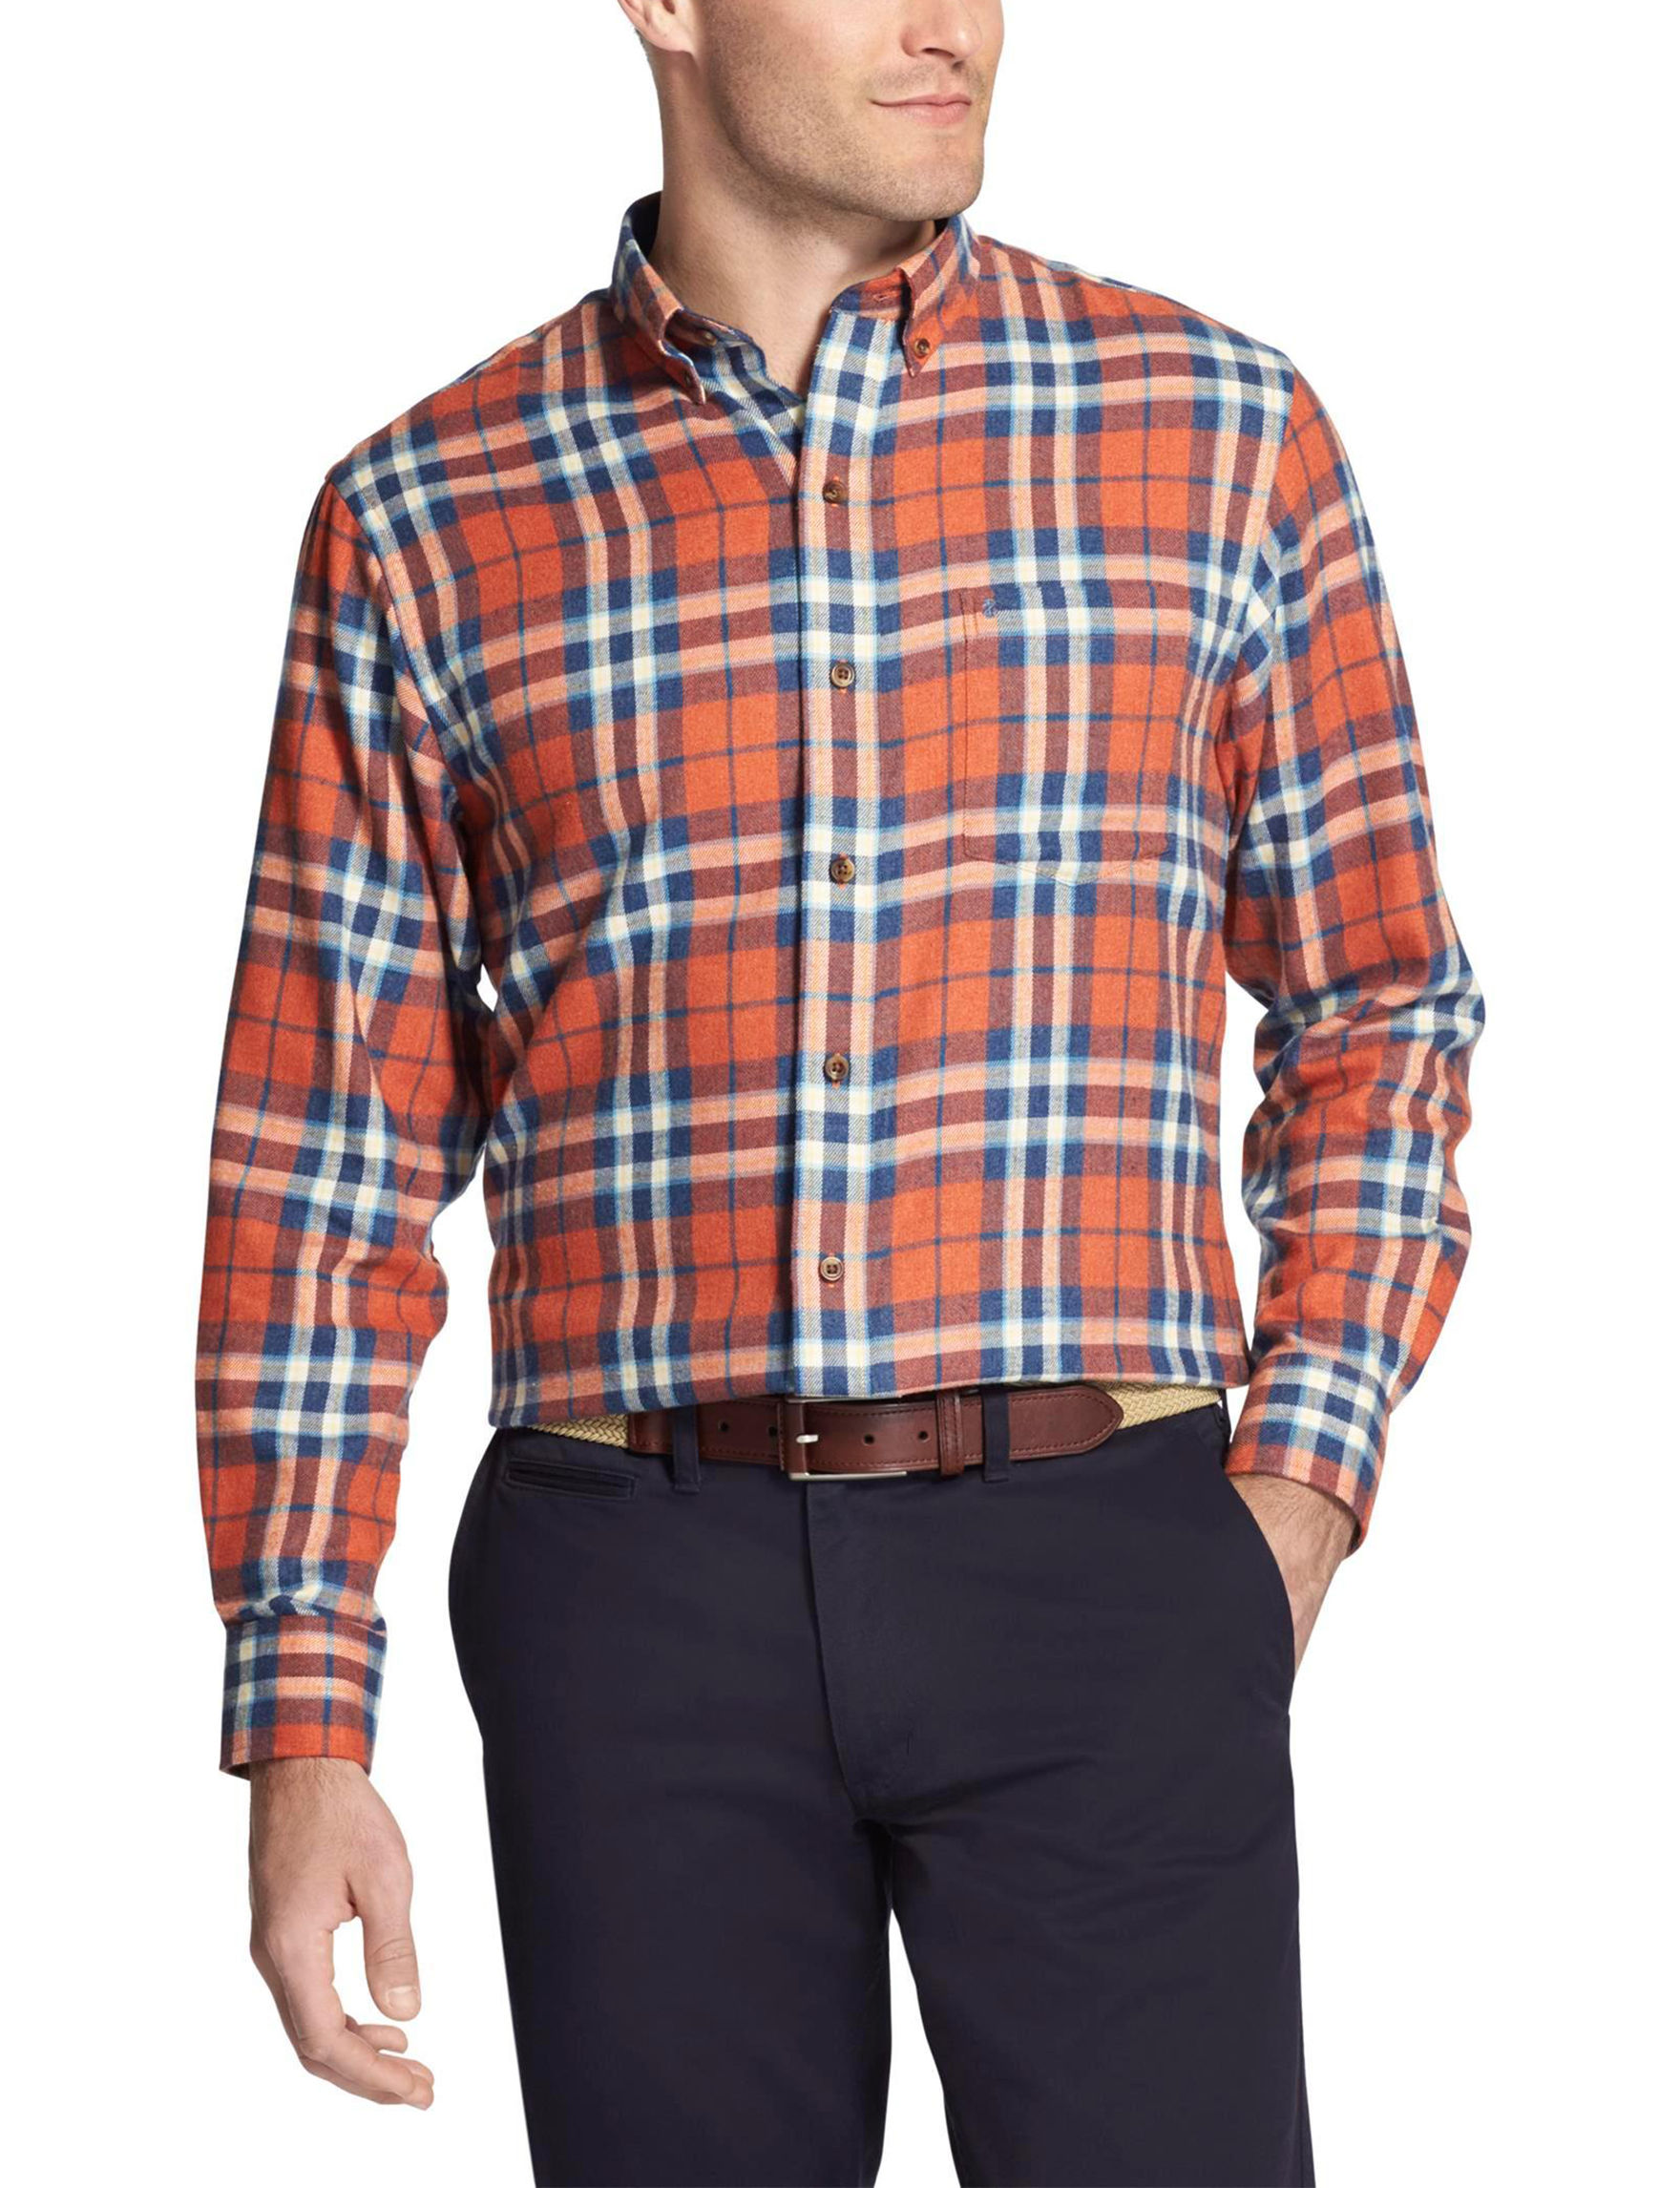 Izod Orange Plaid Casual Button Down Shirts